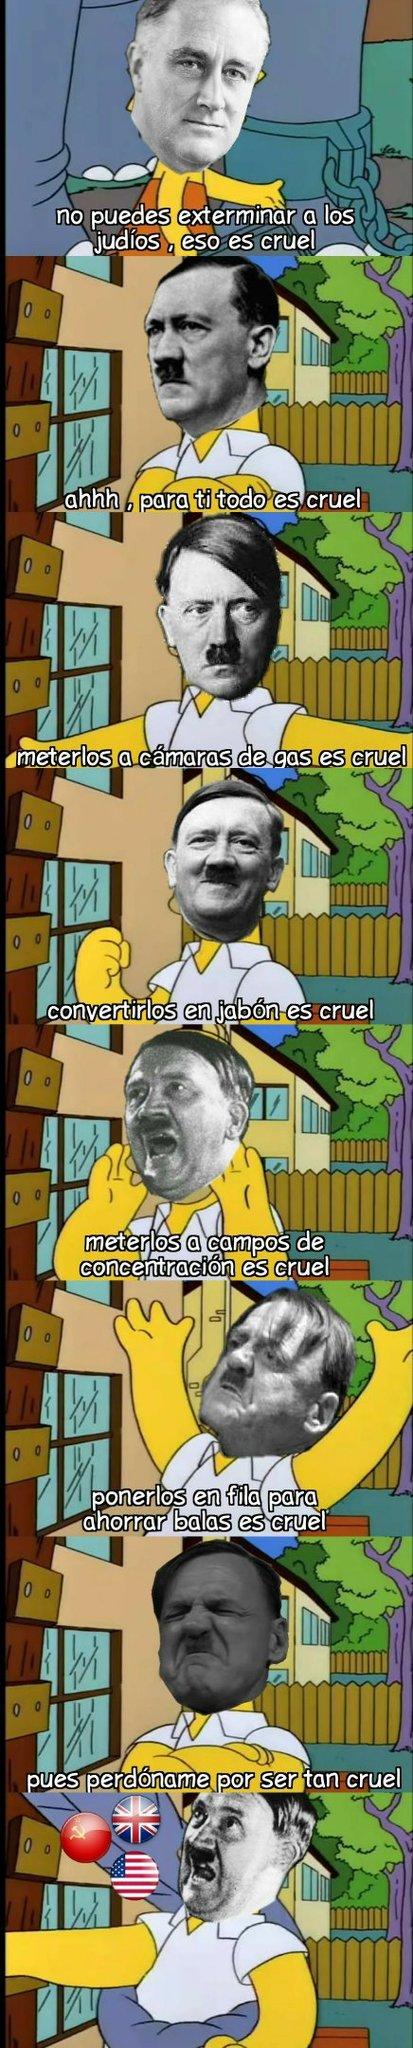 Todo es cruel - meme